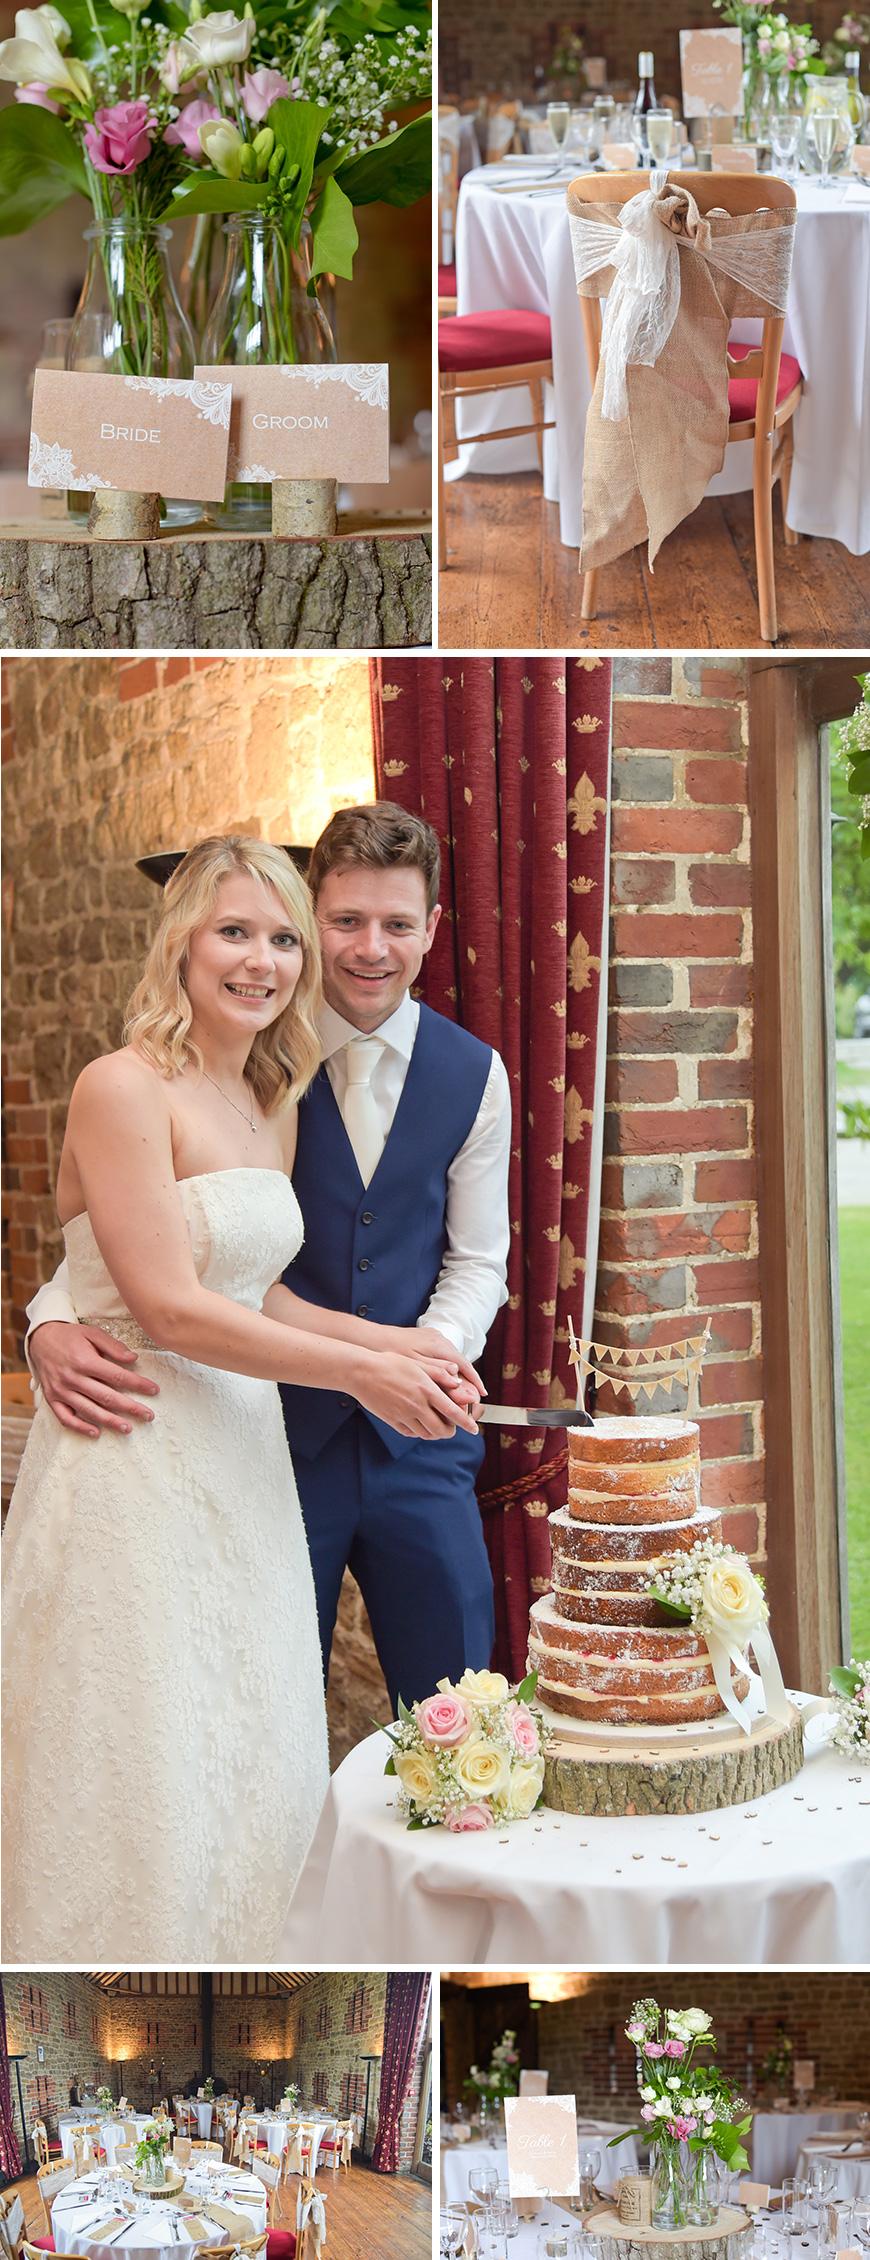 Claudia and Mark's real life wedding at Bartholomew Barn - Wedding Details | CHWV